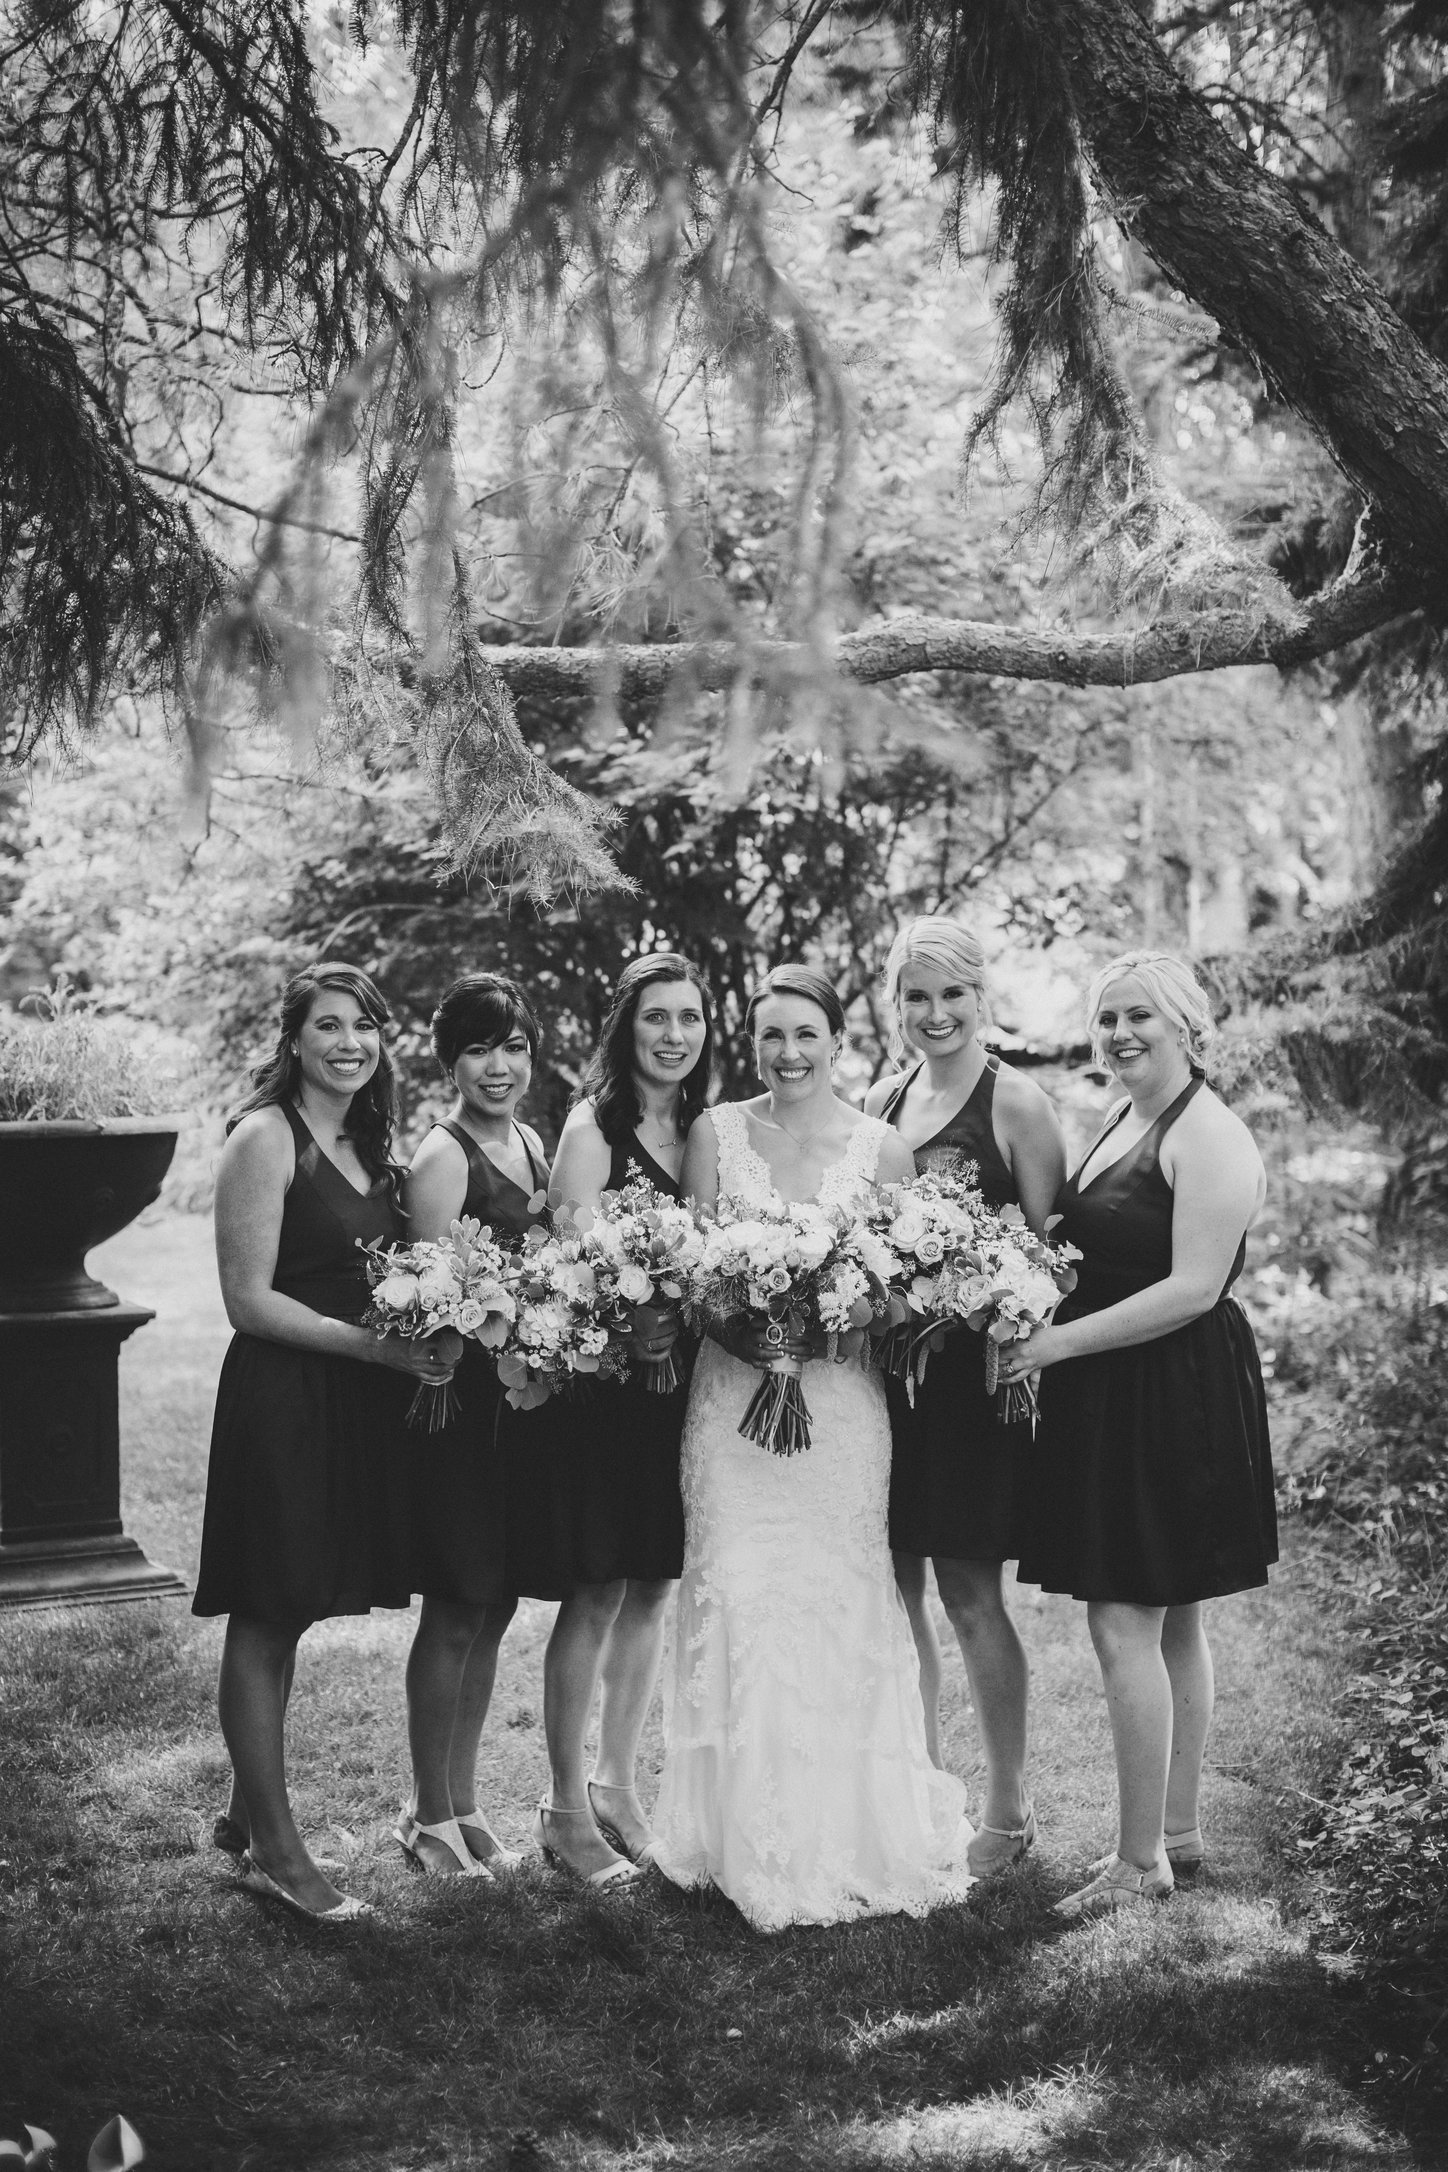 SandC-wedding-371.jpg